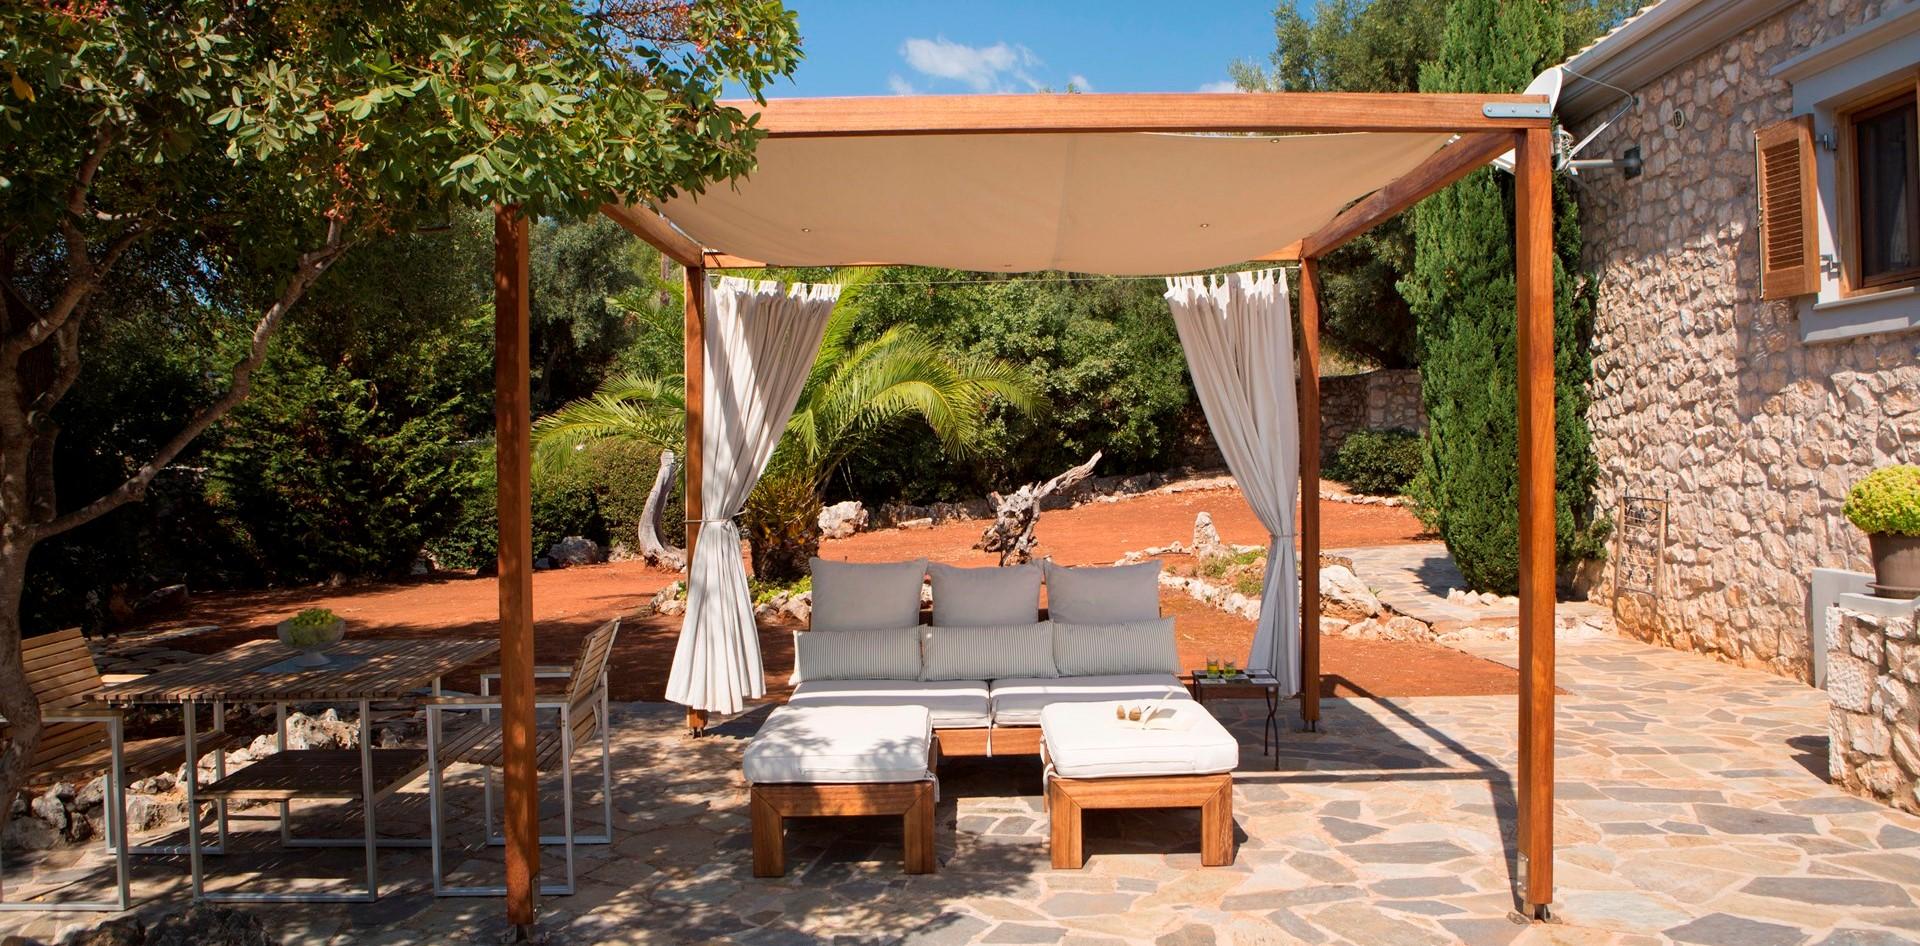 lefkada-cottage-terrace-cabana